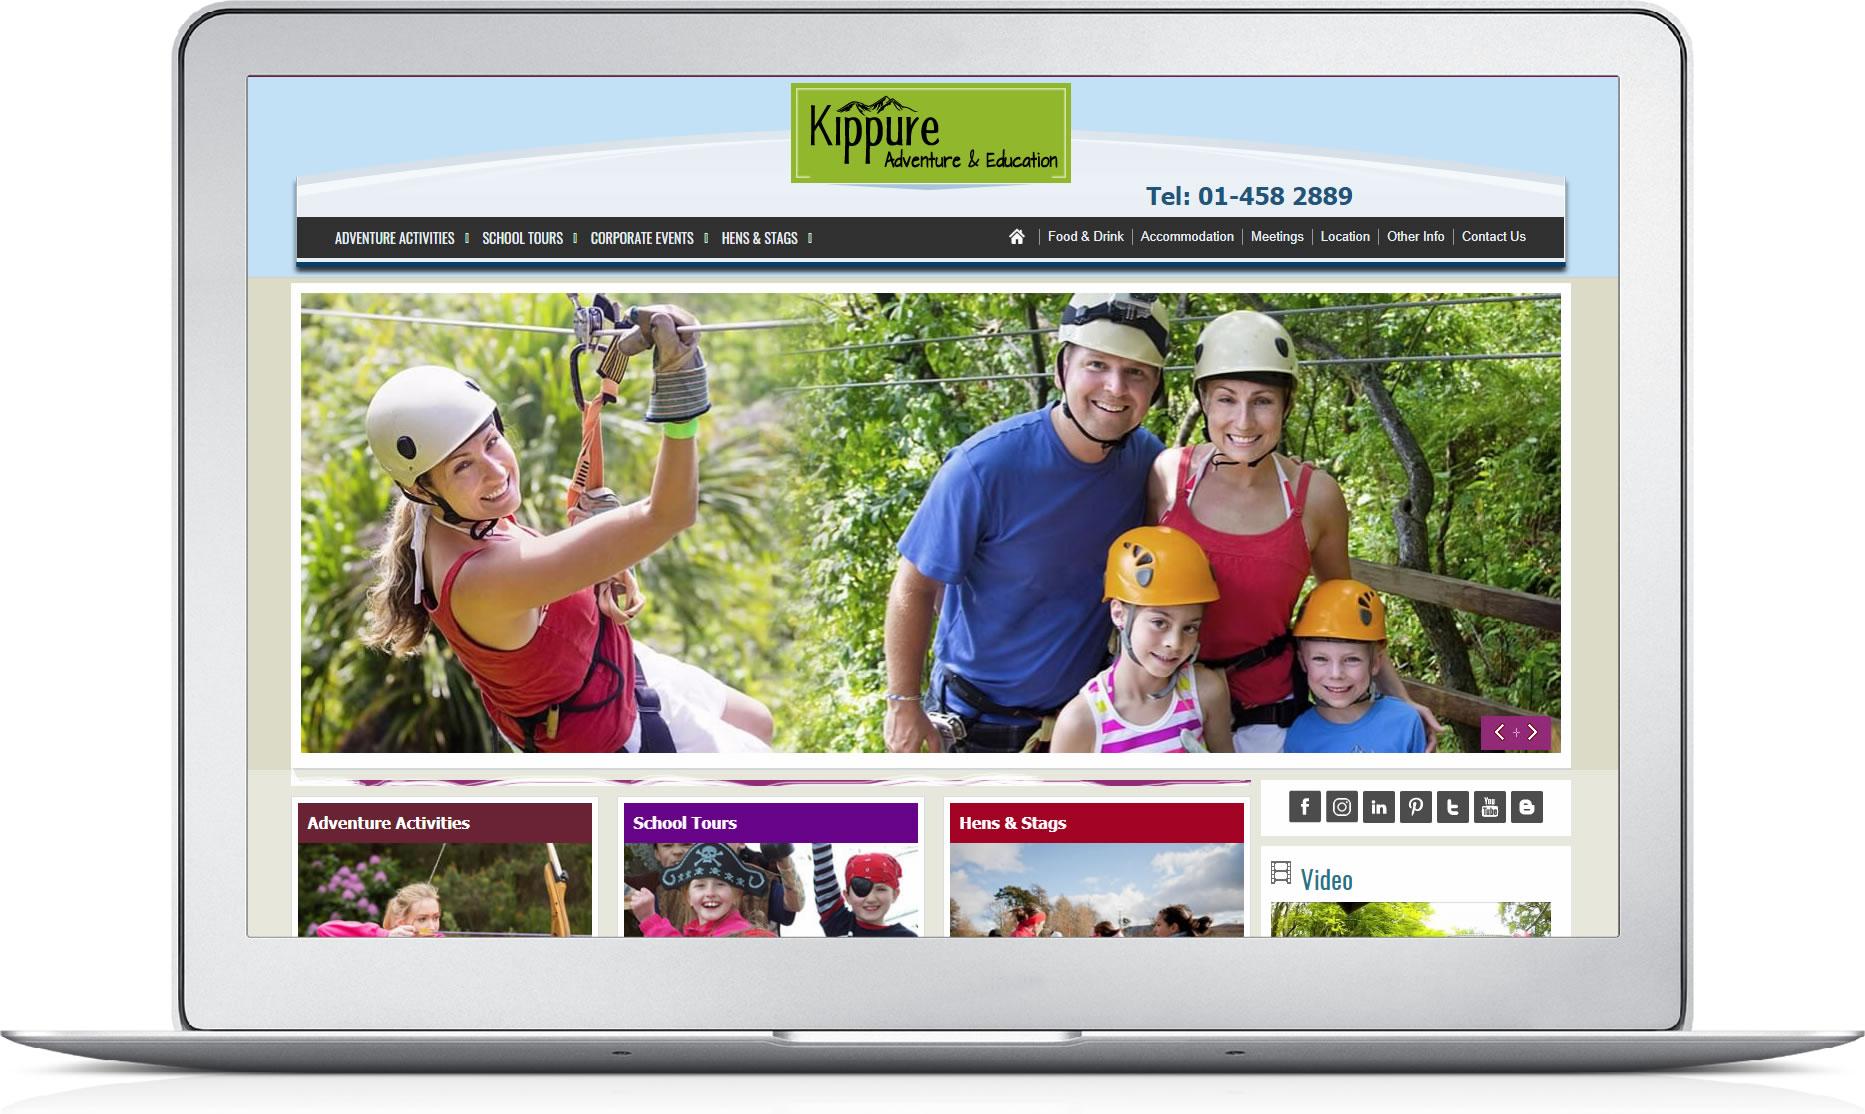 Kippure Adventure Centre Wicklow